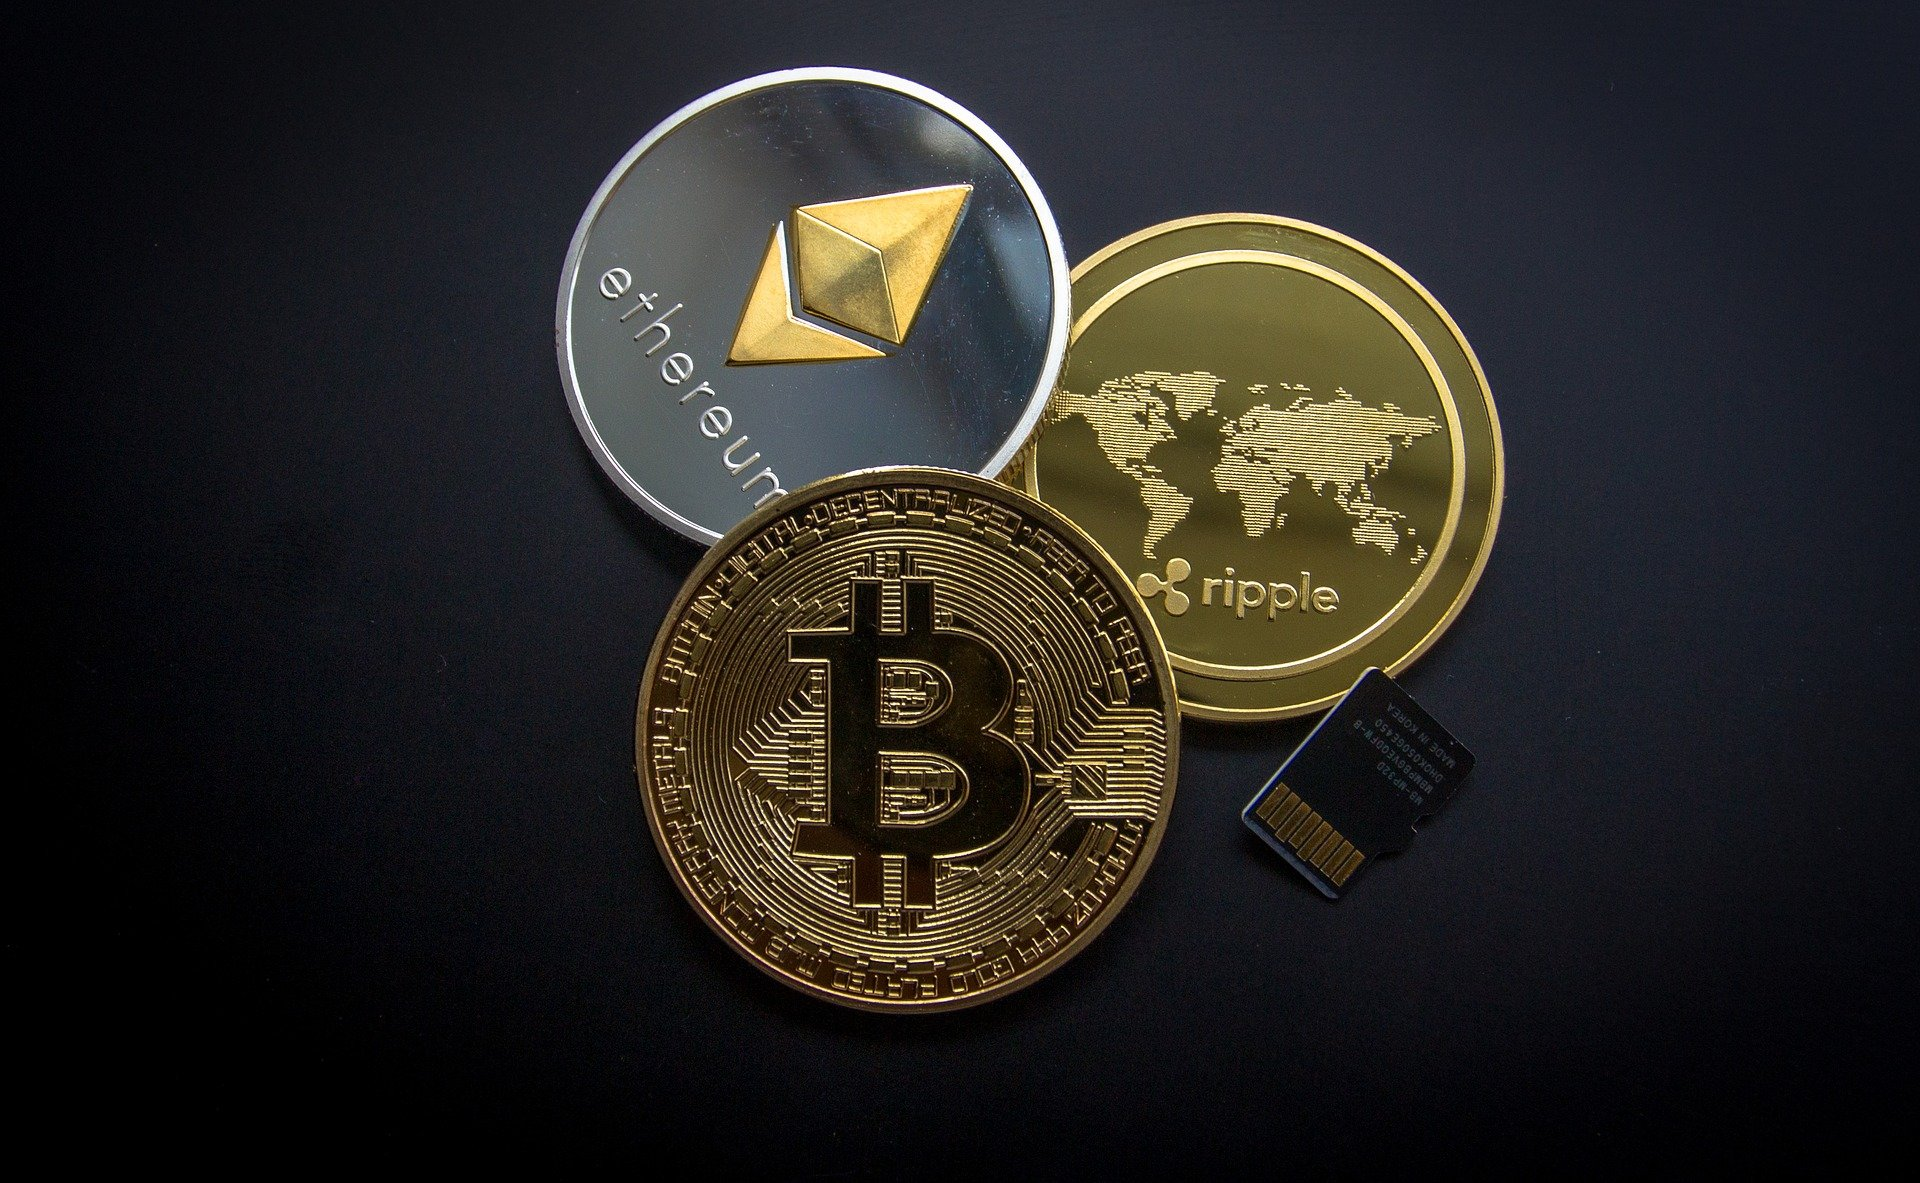 Investir dans les cryptomonnaies - Operation Business